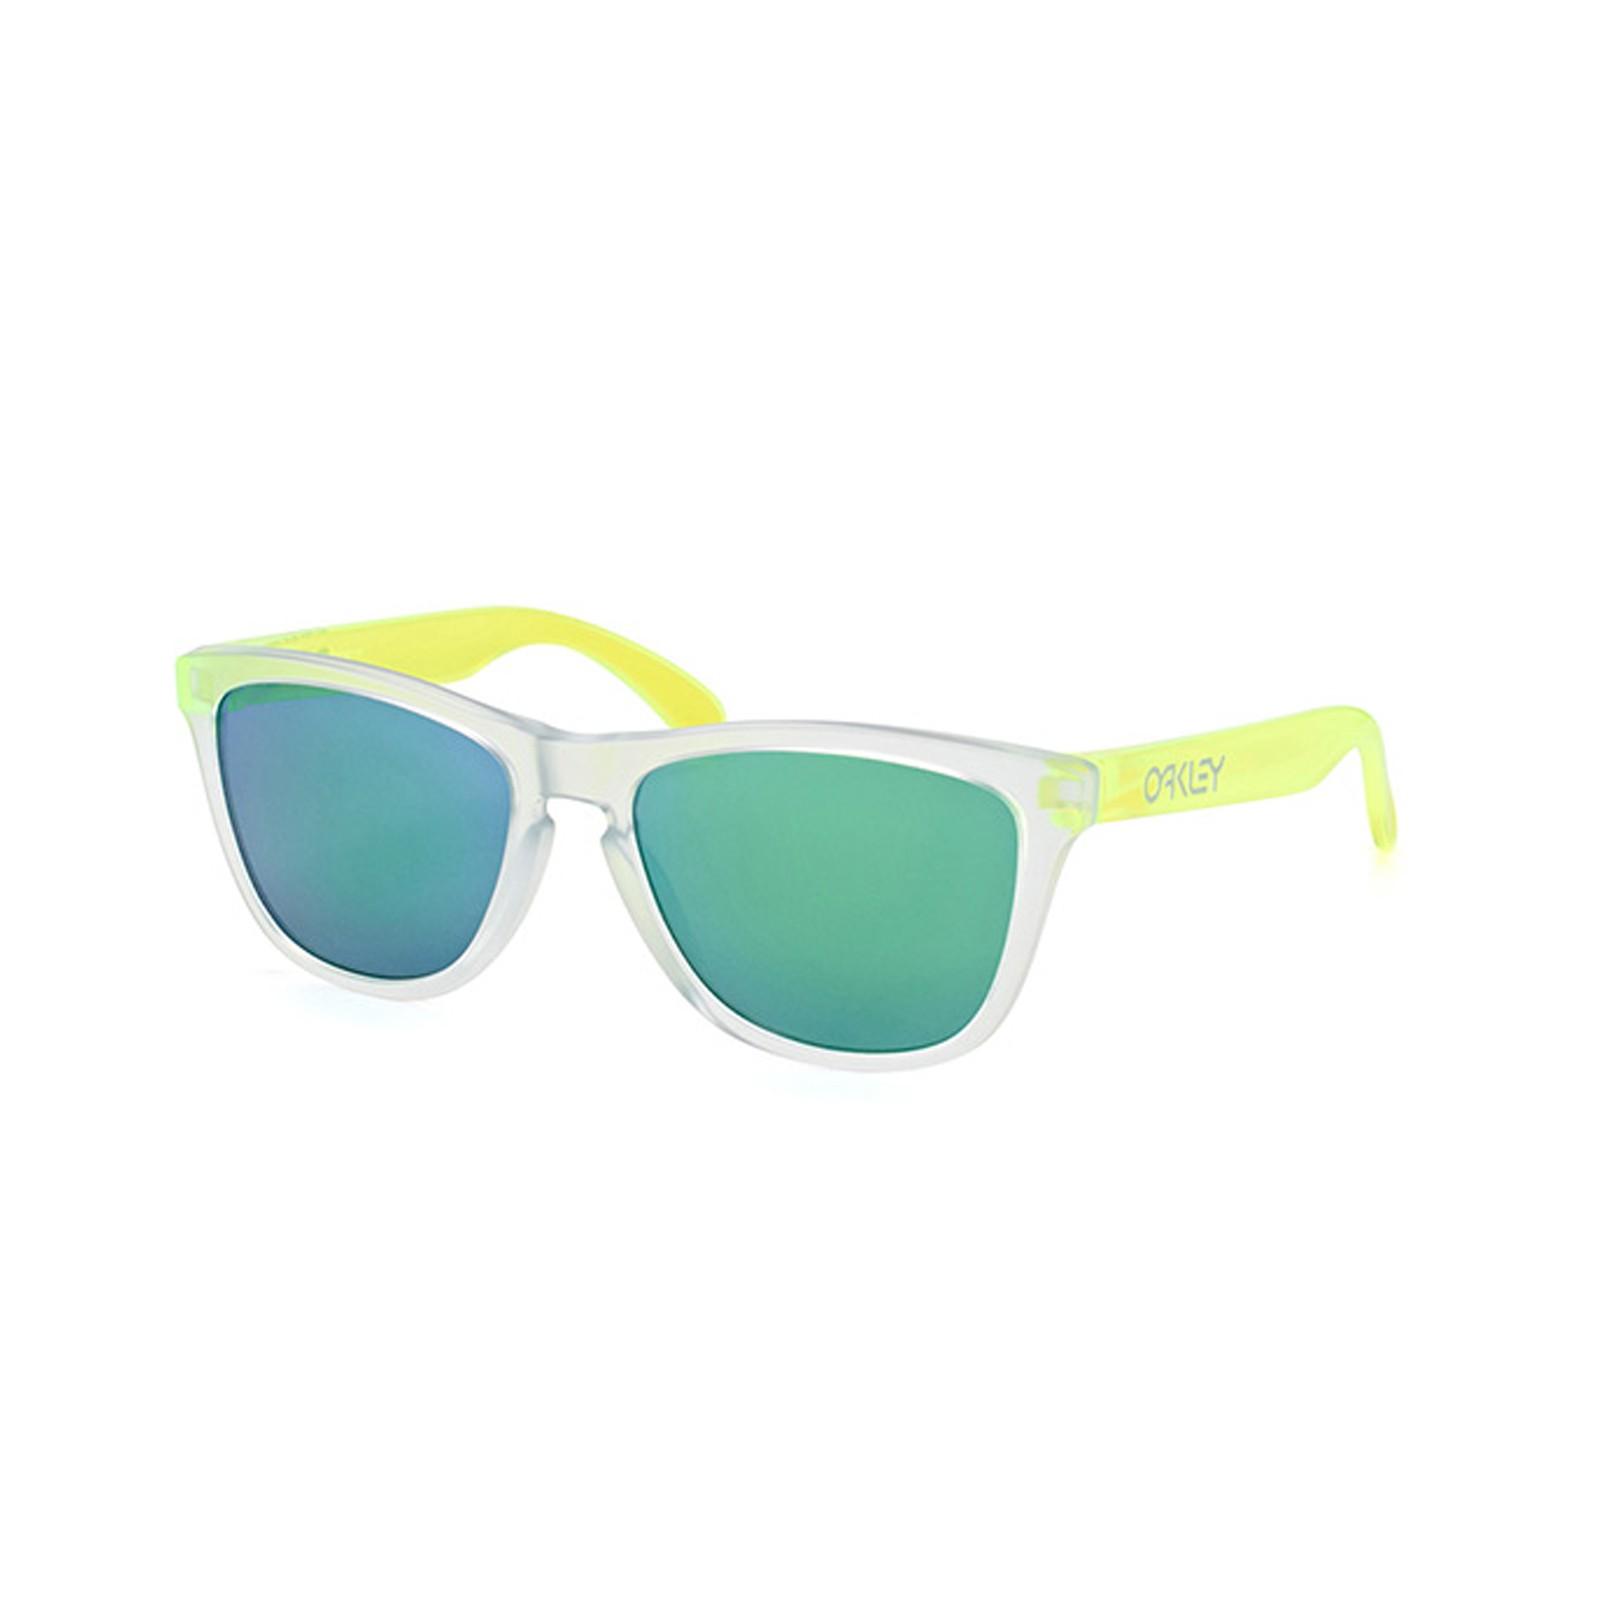 0c899792aed5b Oakley Frogskins Prizm Black Iridium Unisex Sunglasses OK-9013-9013C4-55  Display Gallery Item 1 ...